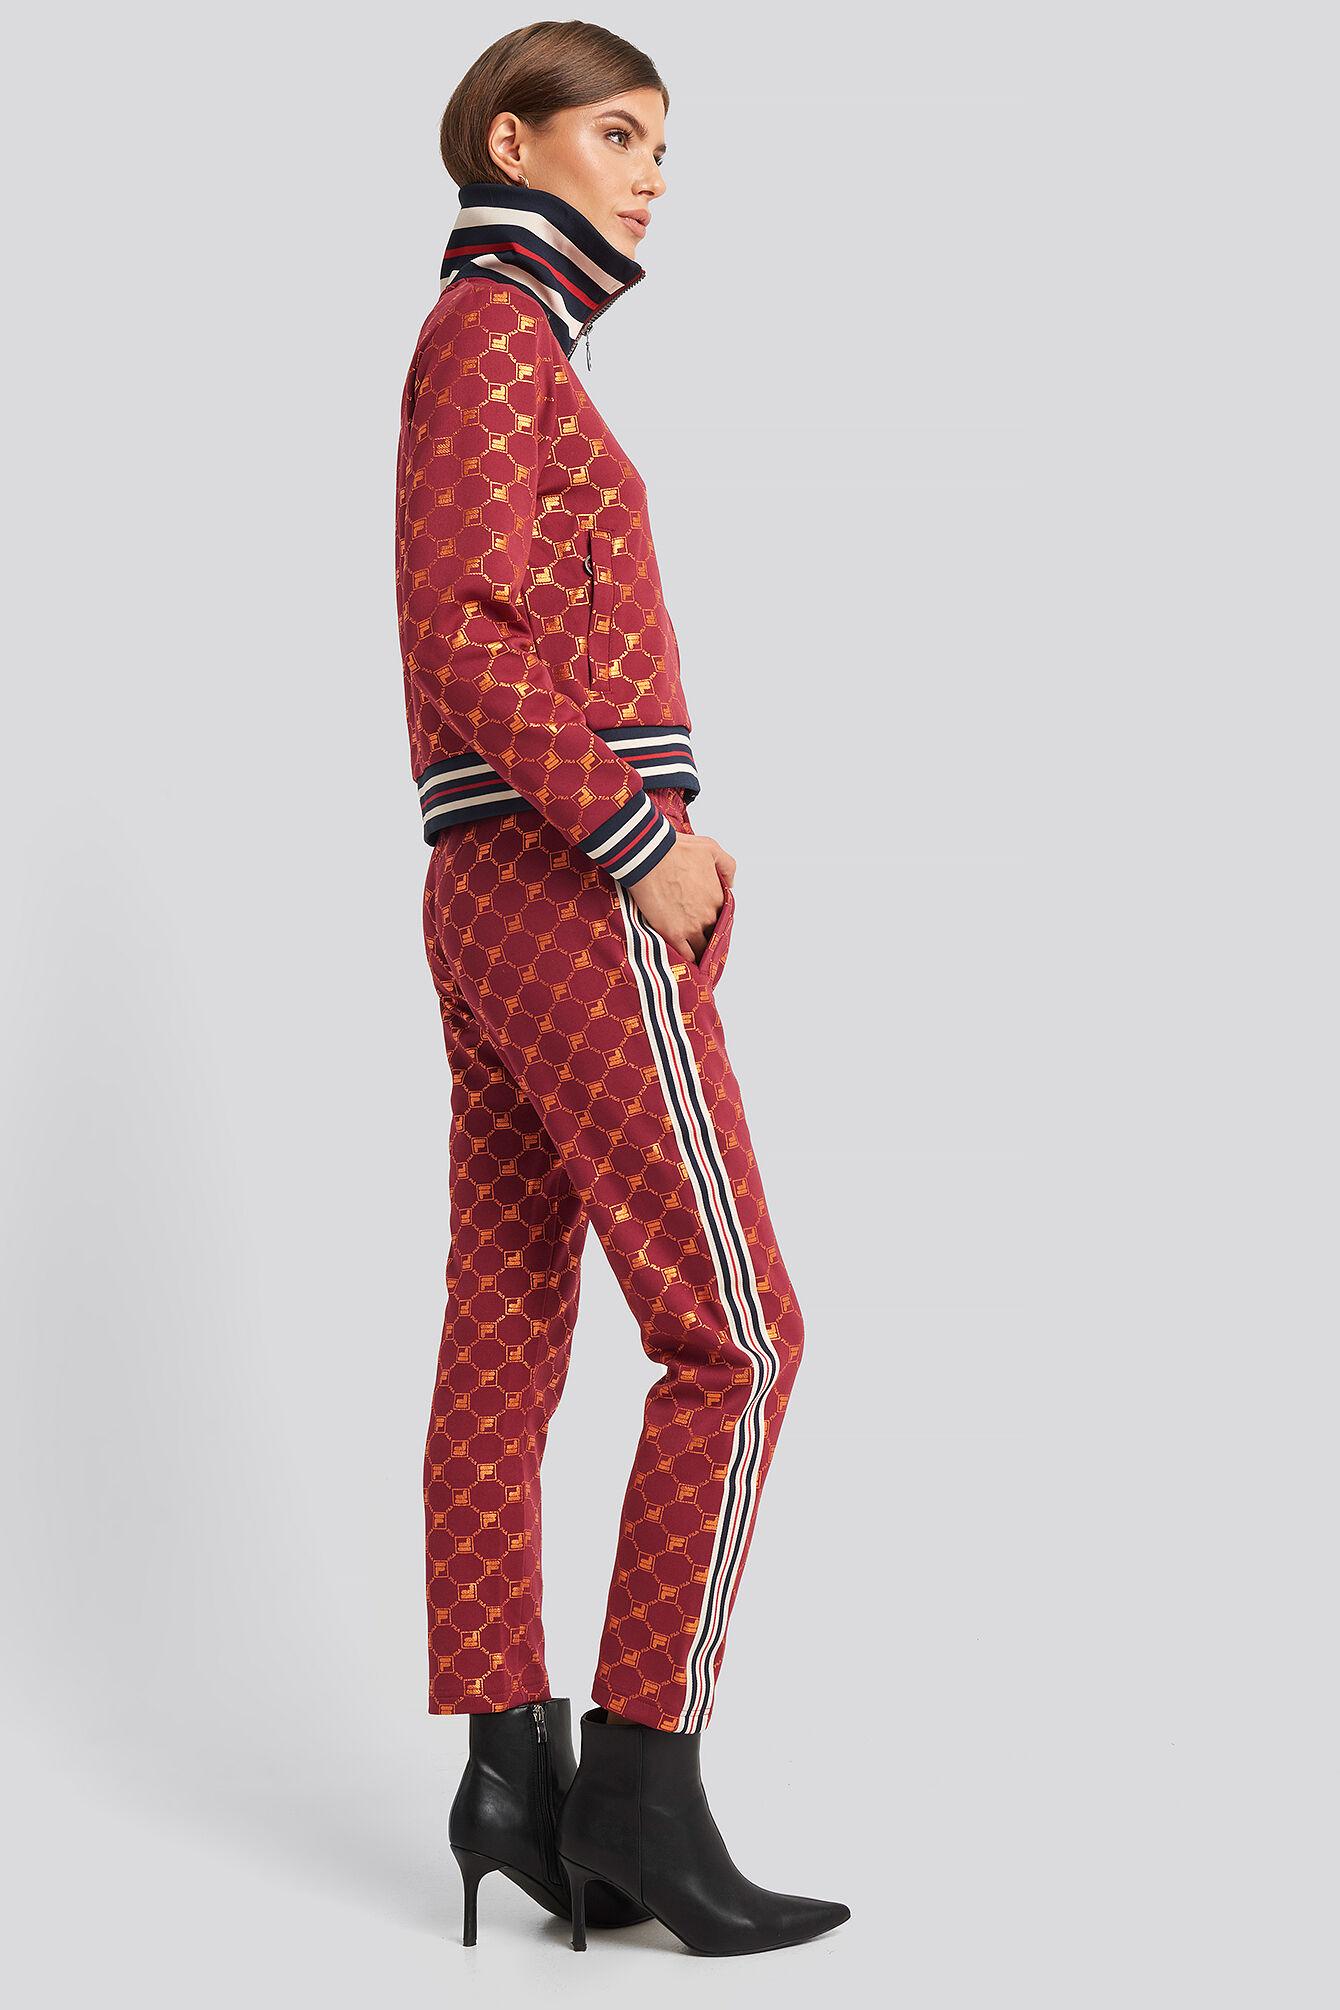 FILA Gvantsa Cropped Pants - Red